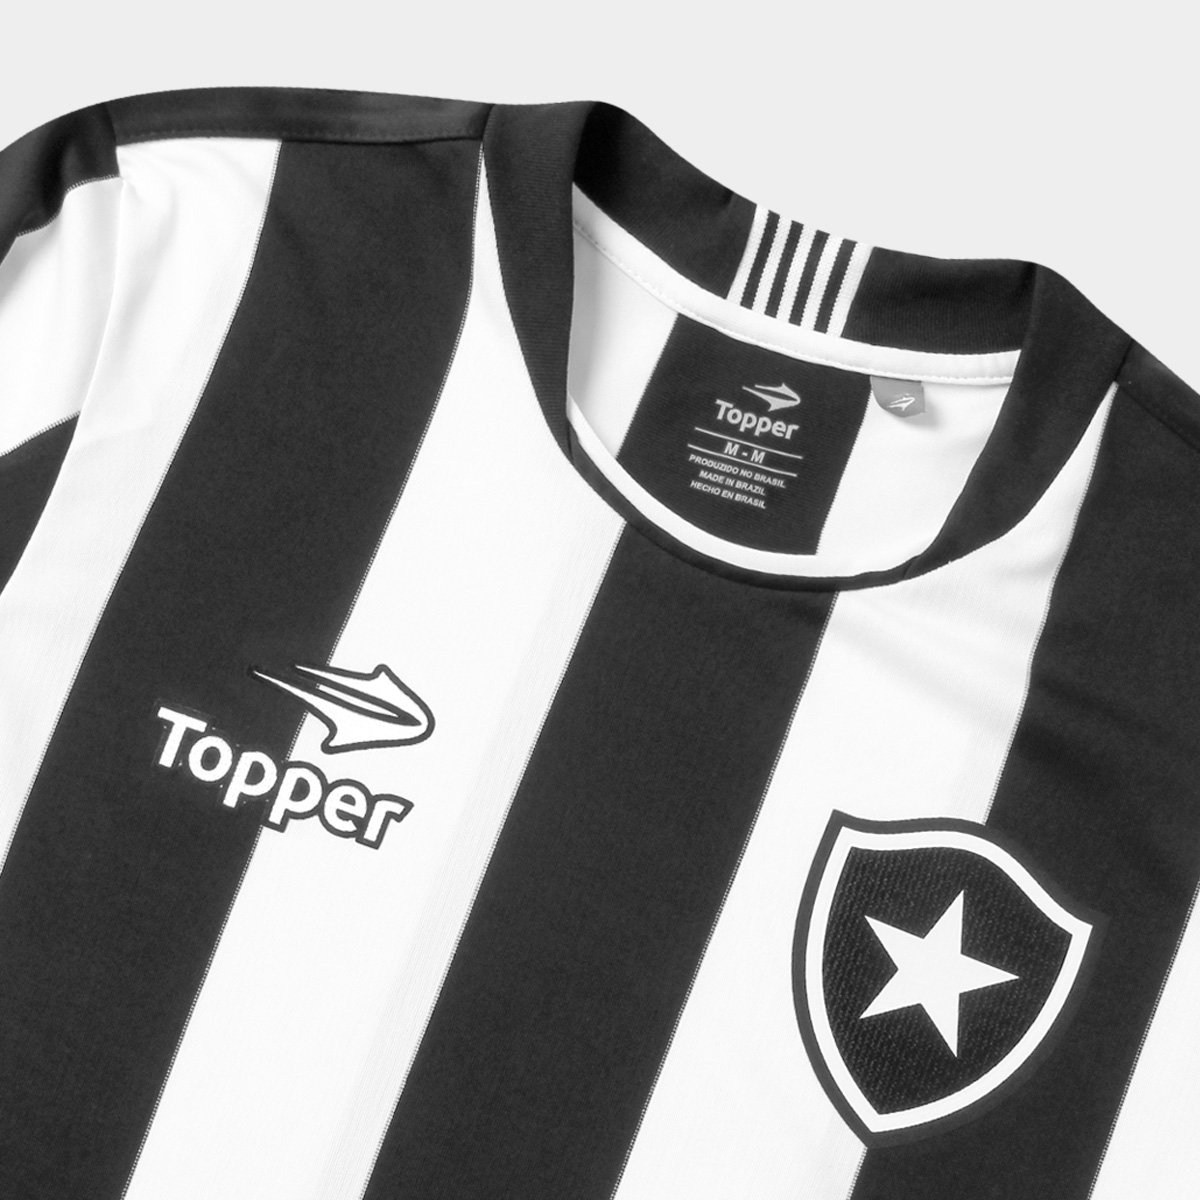 Camisa Botafogo I 2016 s nº Torcedor Topper Masculina - Preto e ... 67fe1c0cb19f1